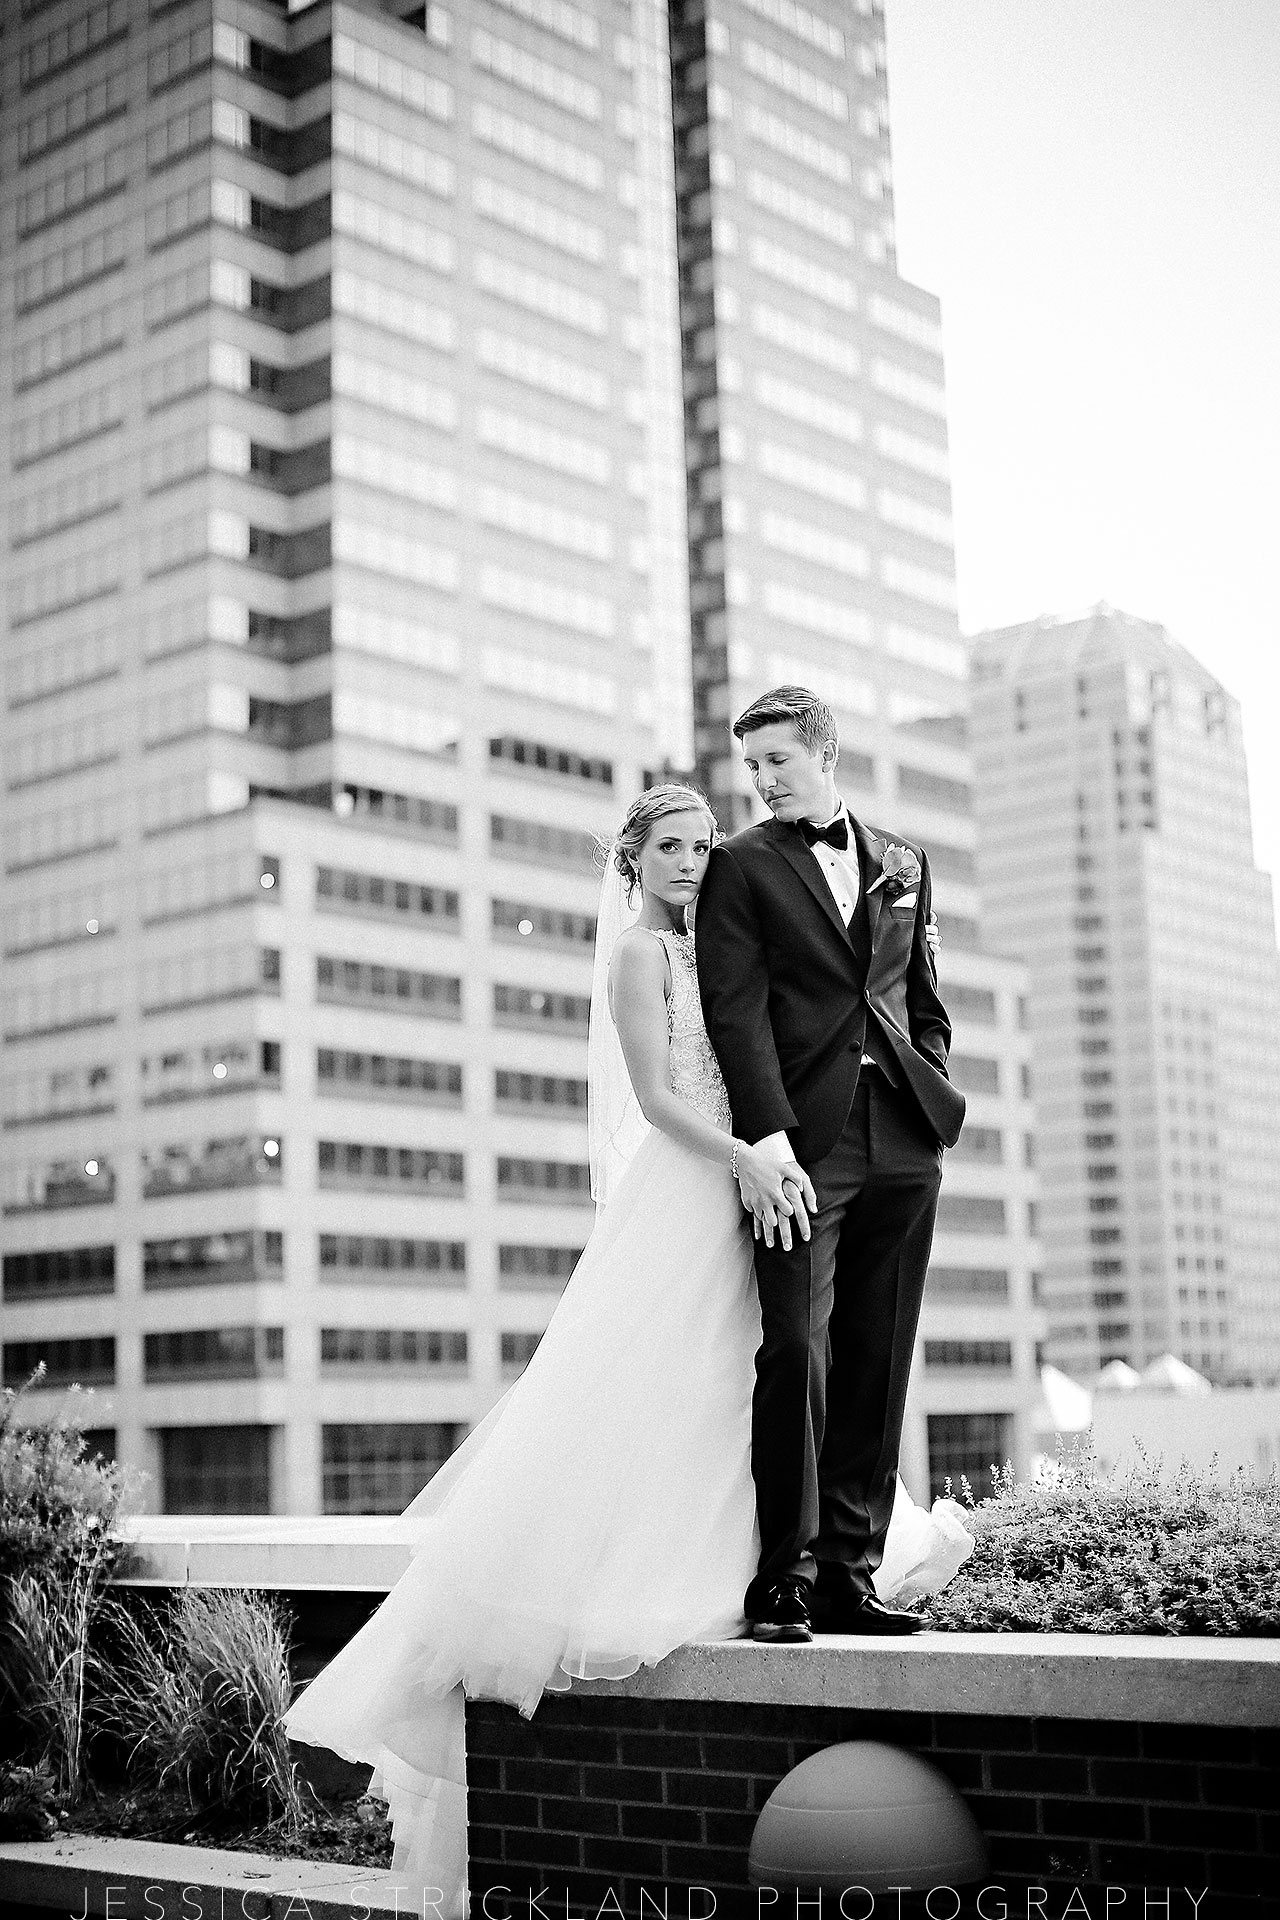 Serra Alex Regions Tower Indianapolis Wedding 228 watermarked